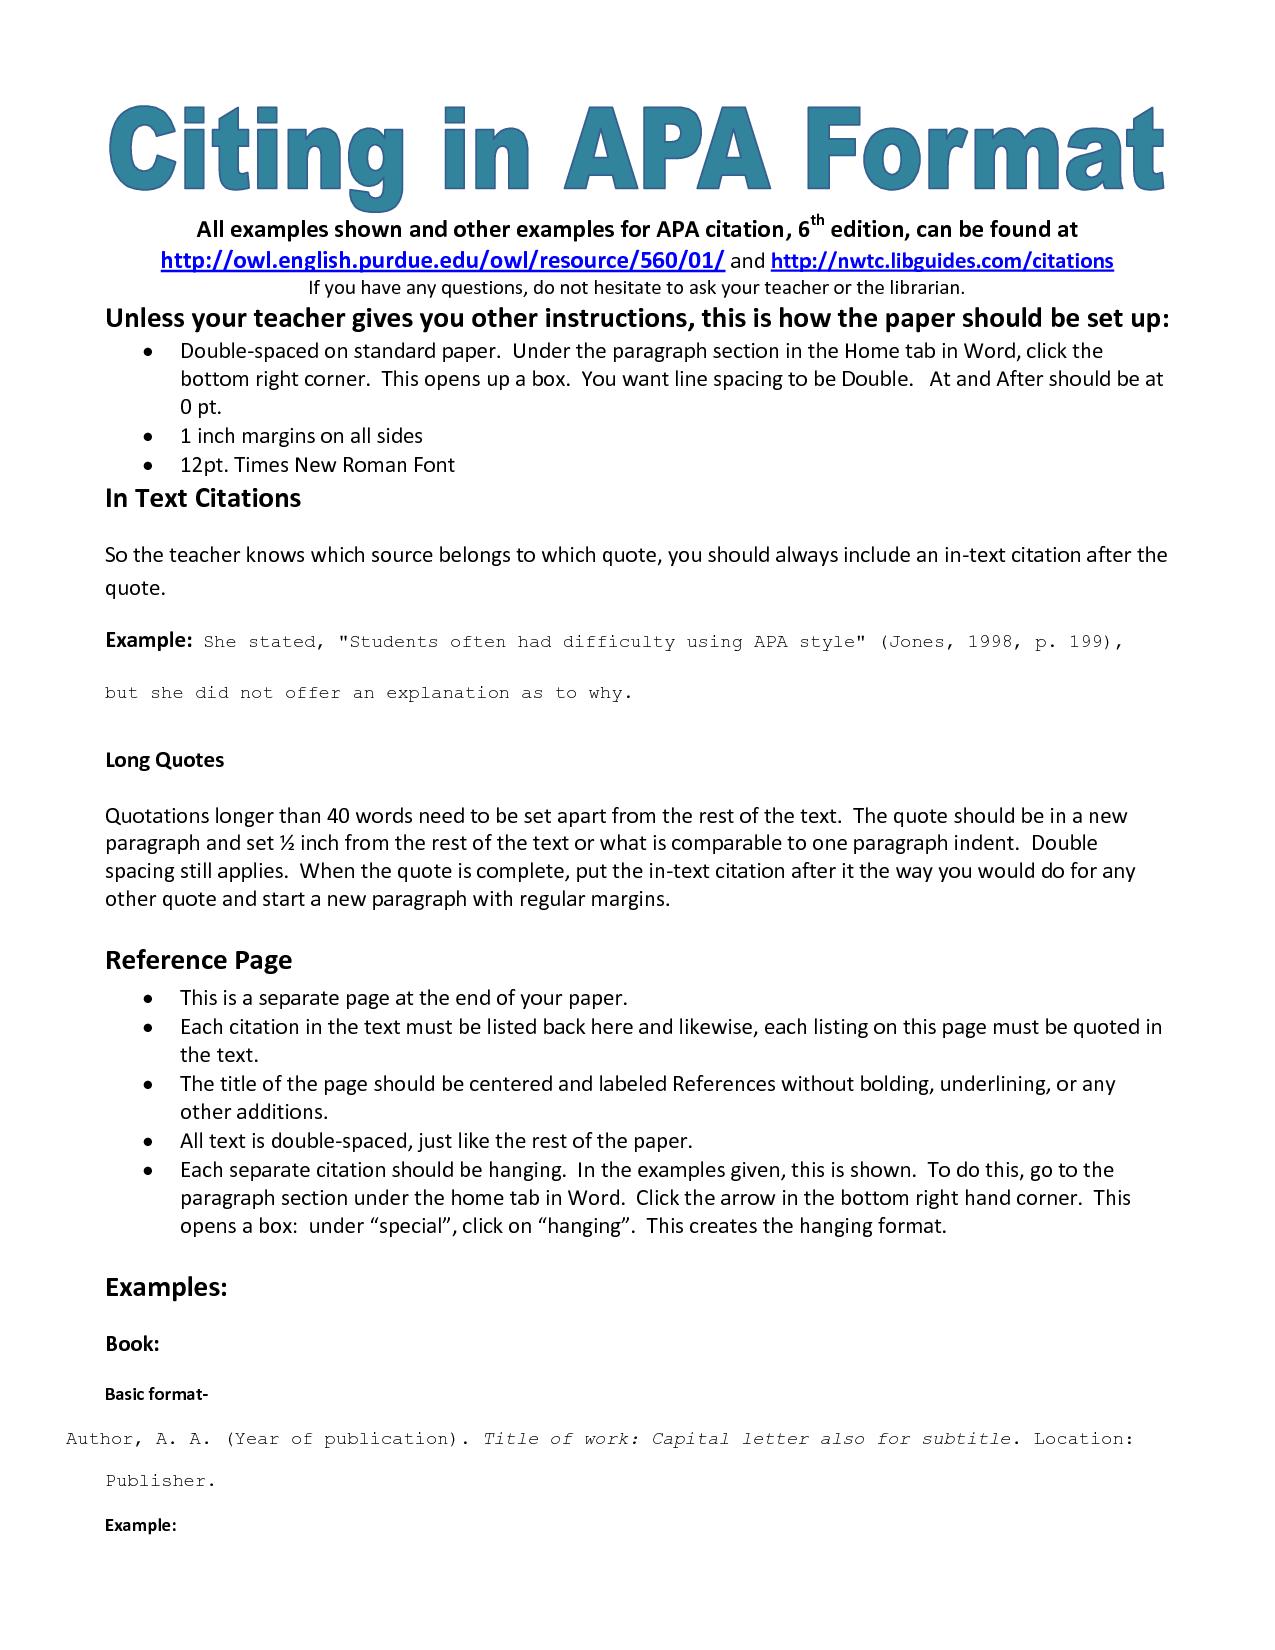 006 Essay Format Apa Fantastic Sample 500 Word Cover Page Full